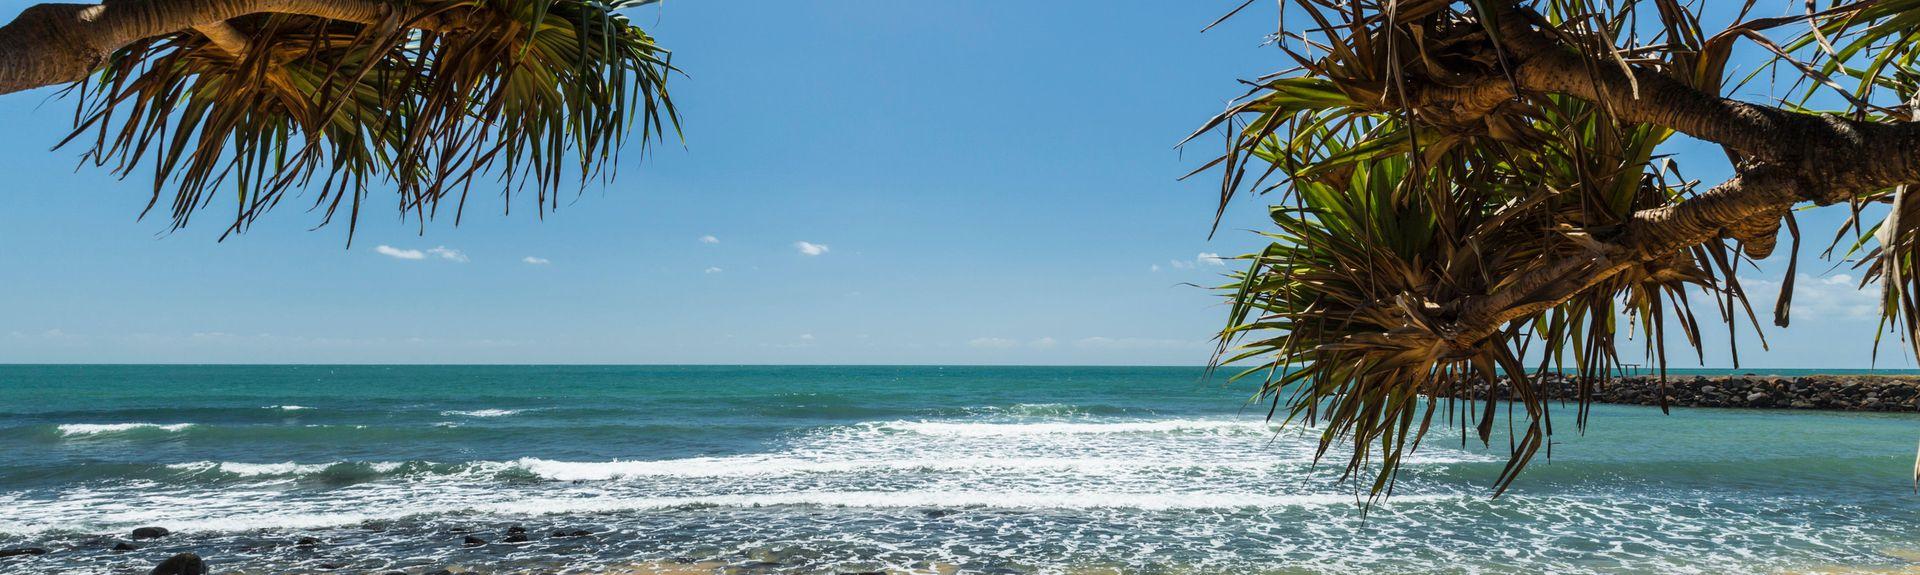 Bundaberg QLD, Australia